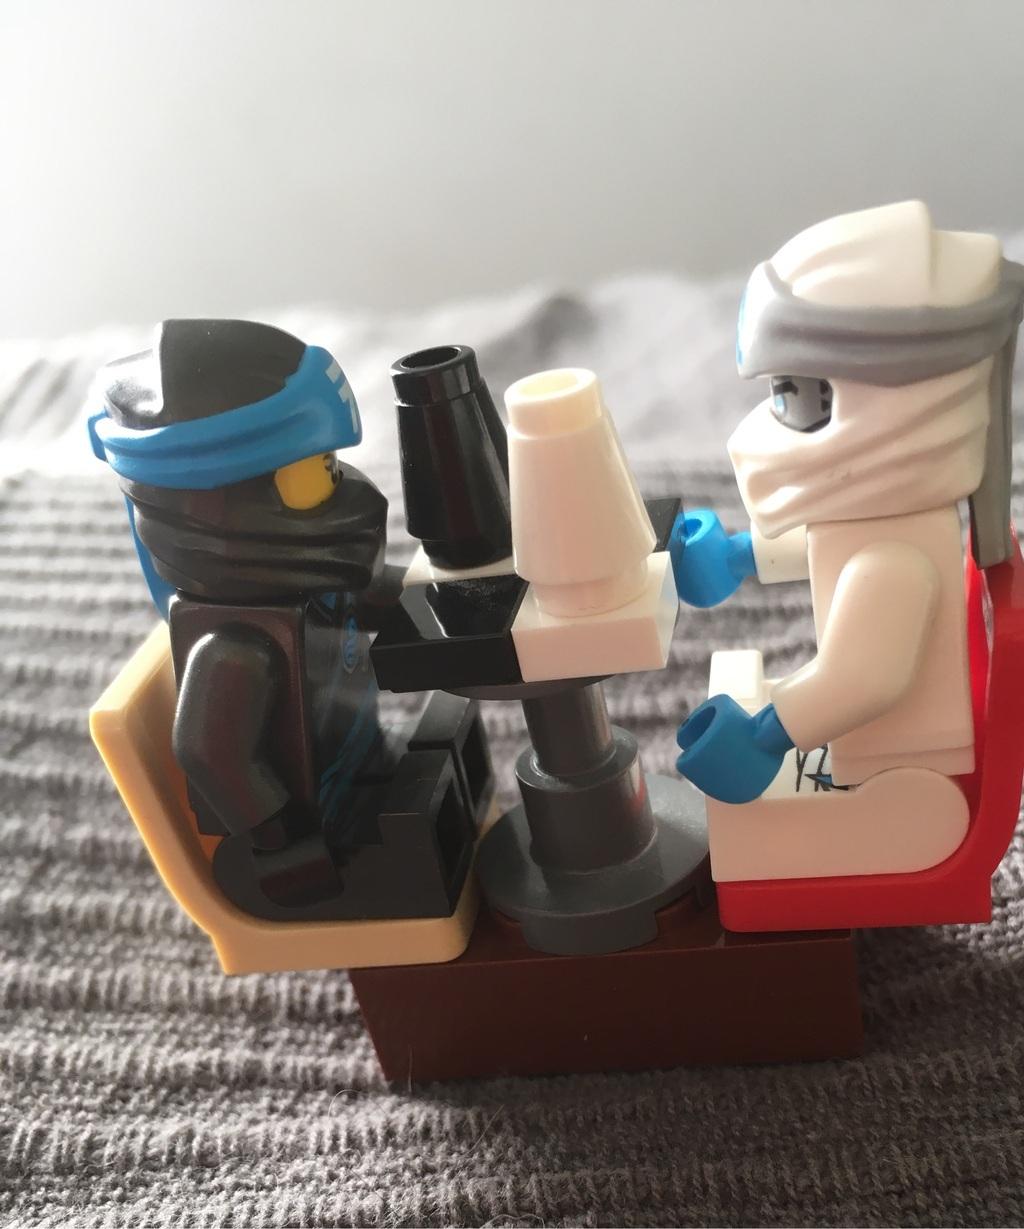 De kör schack